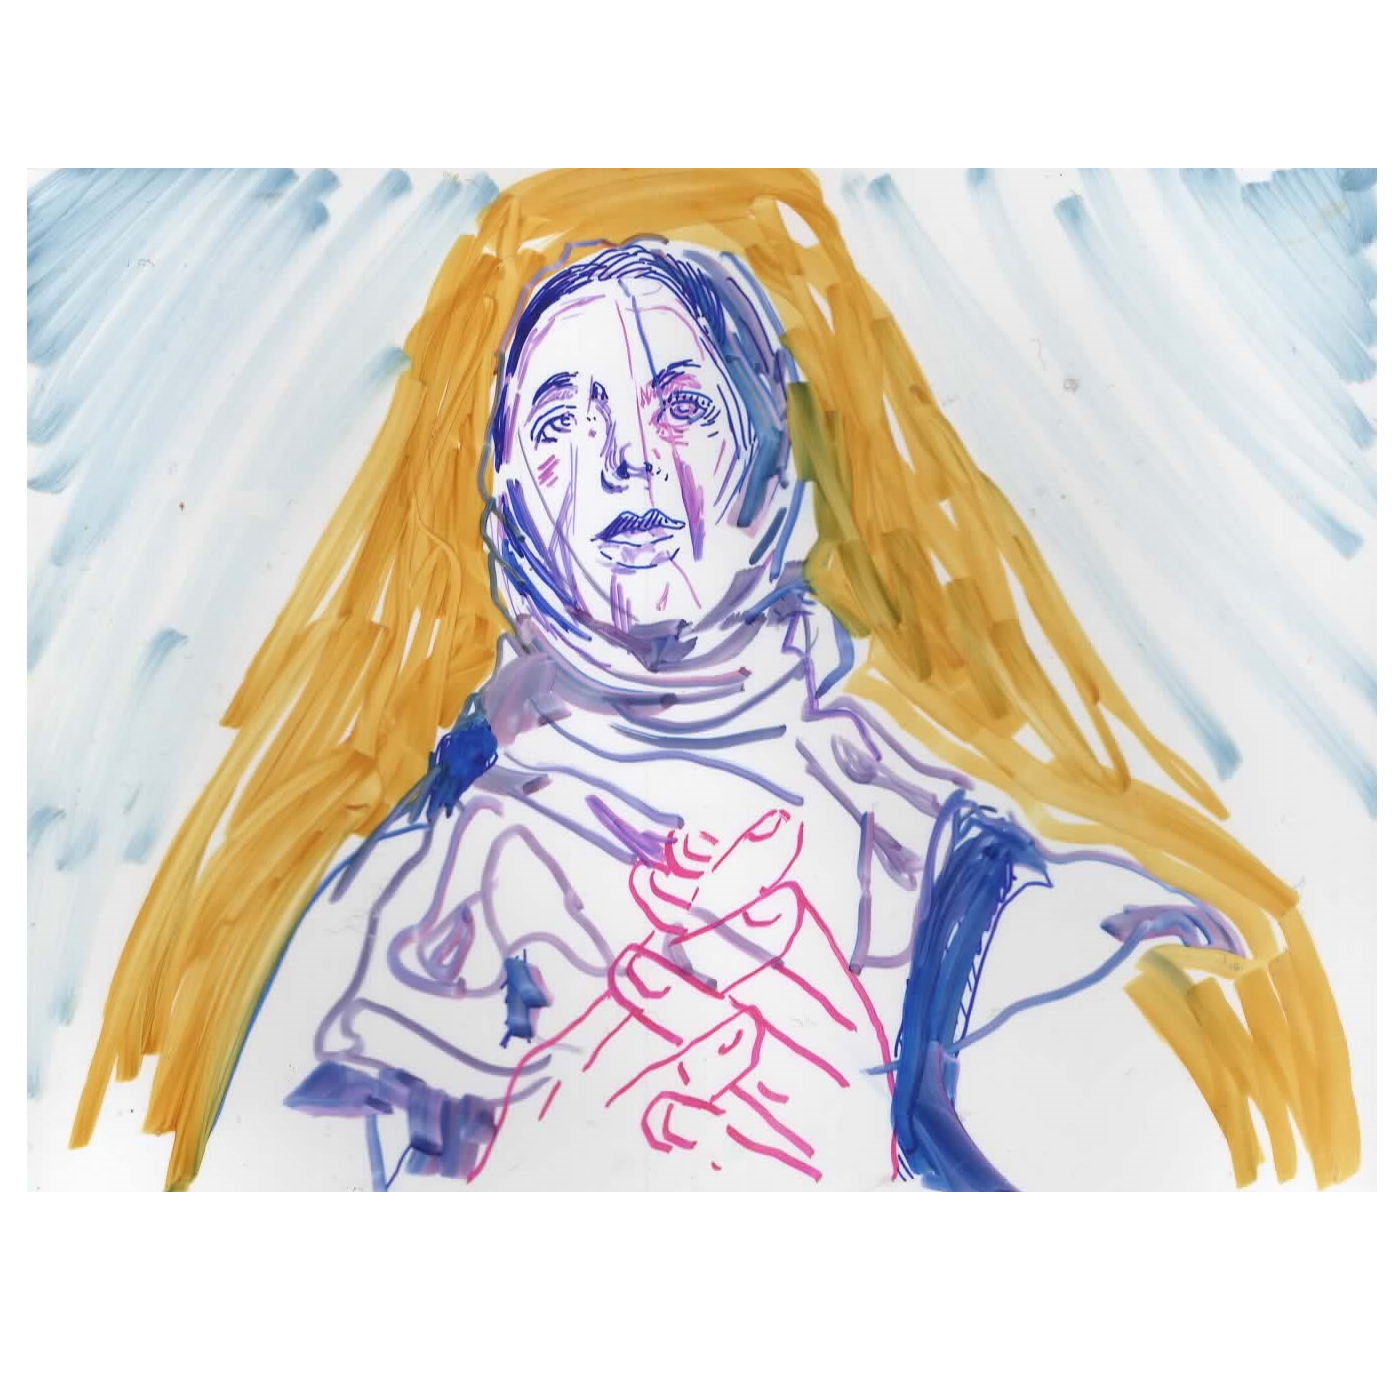 Saint Kim the 10 minute Veiled Shrink Film portrait